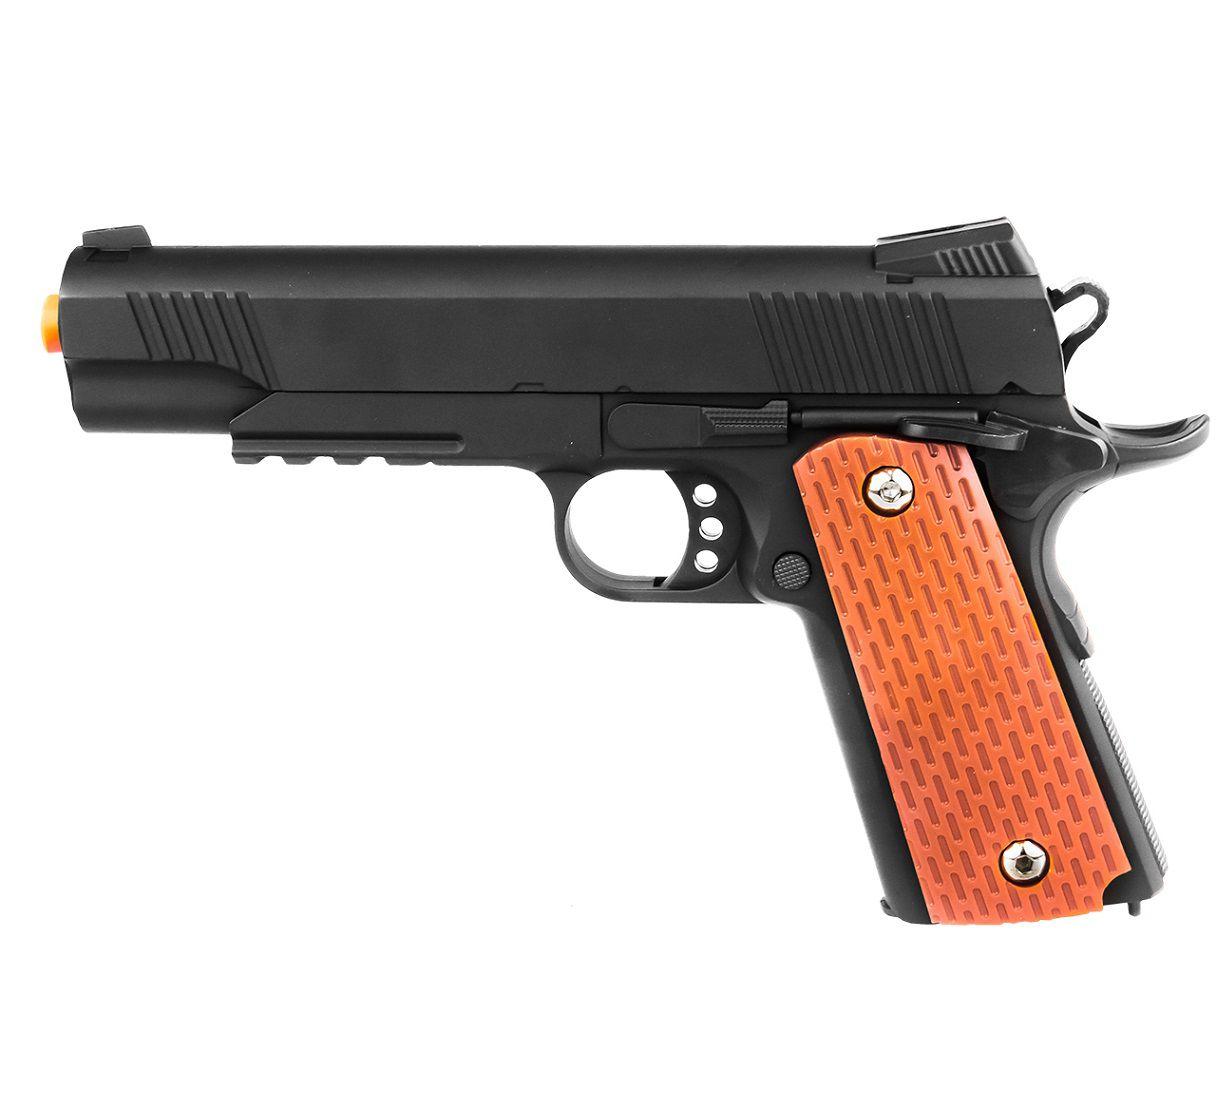 Pistola Airsoft Spring VG 1911-V13 Metal Mola